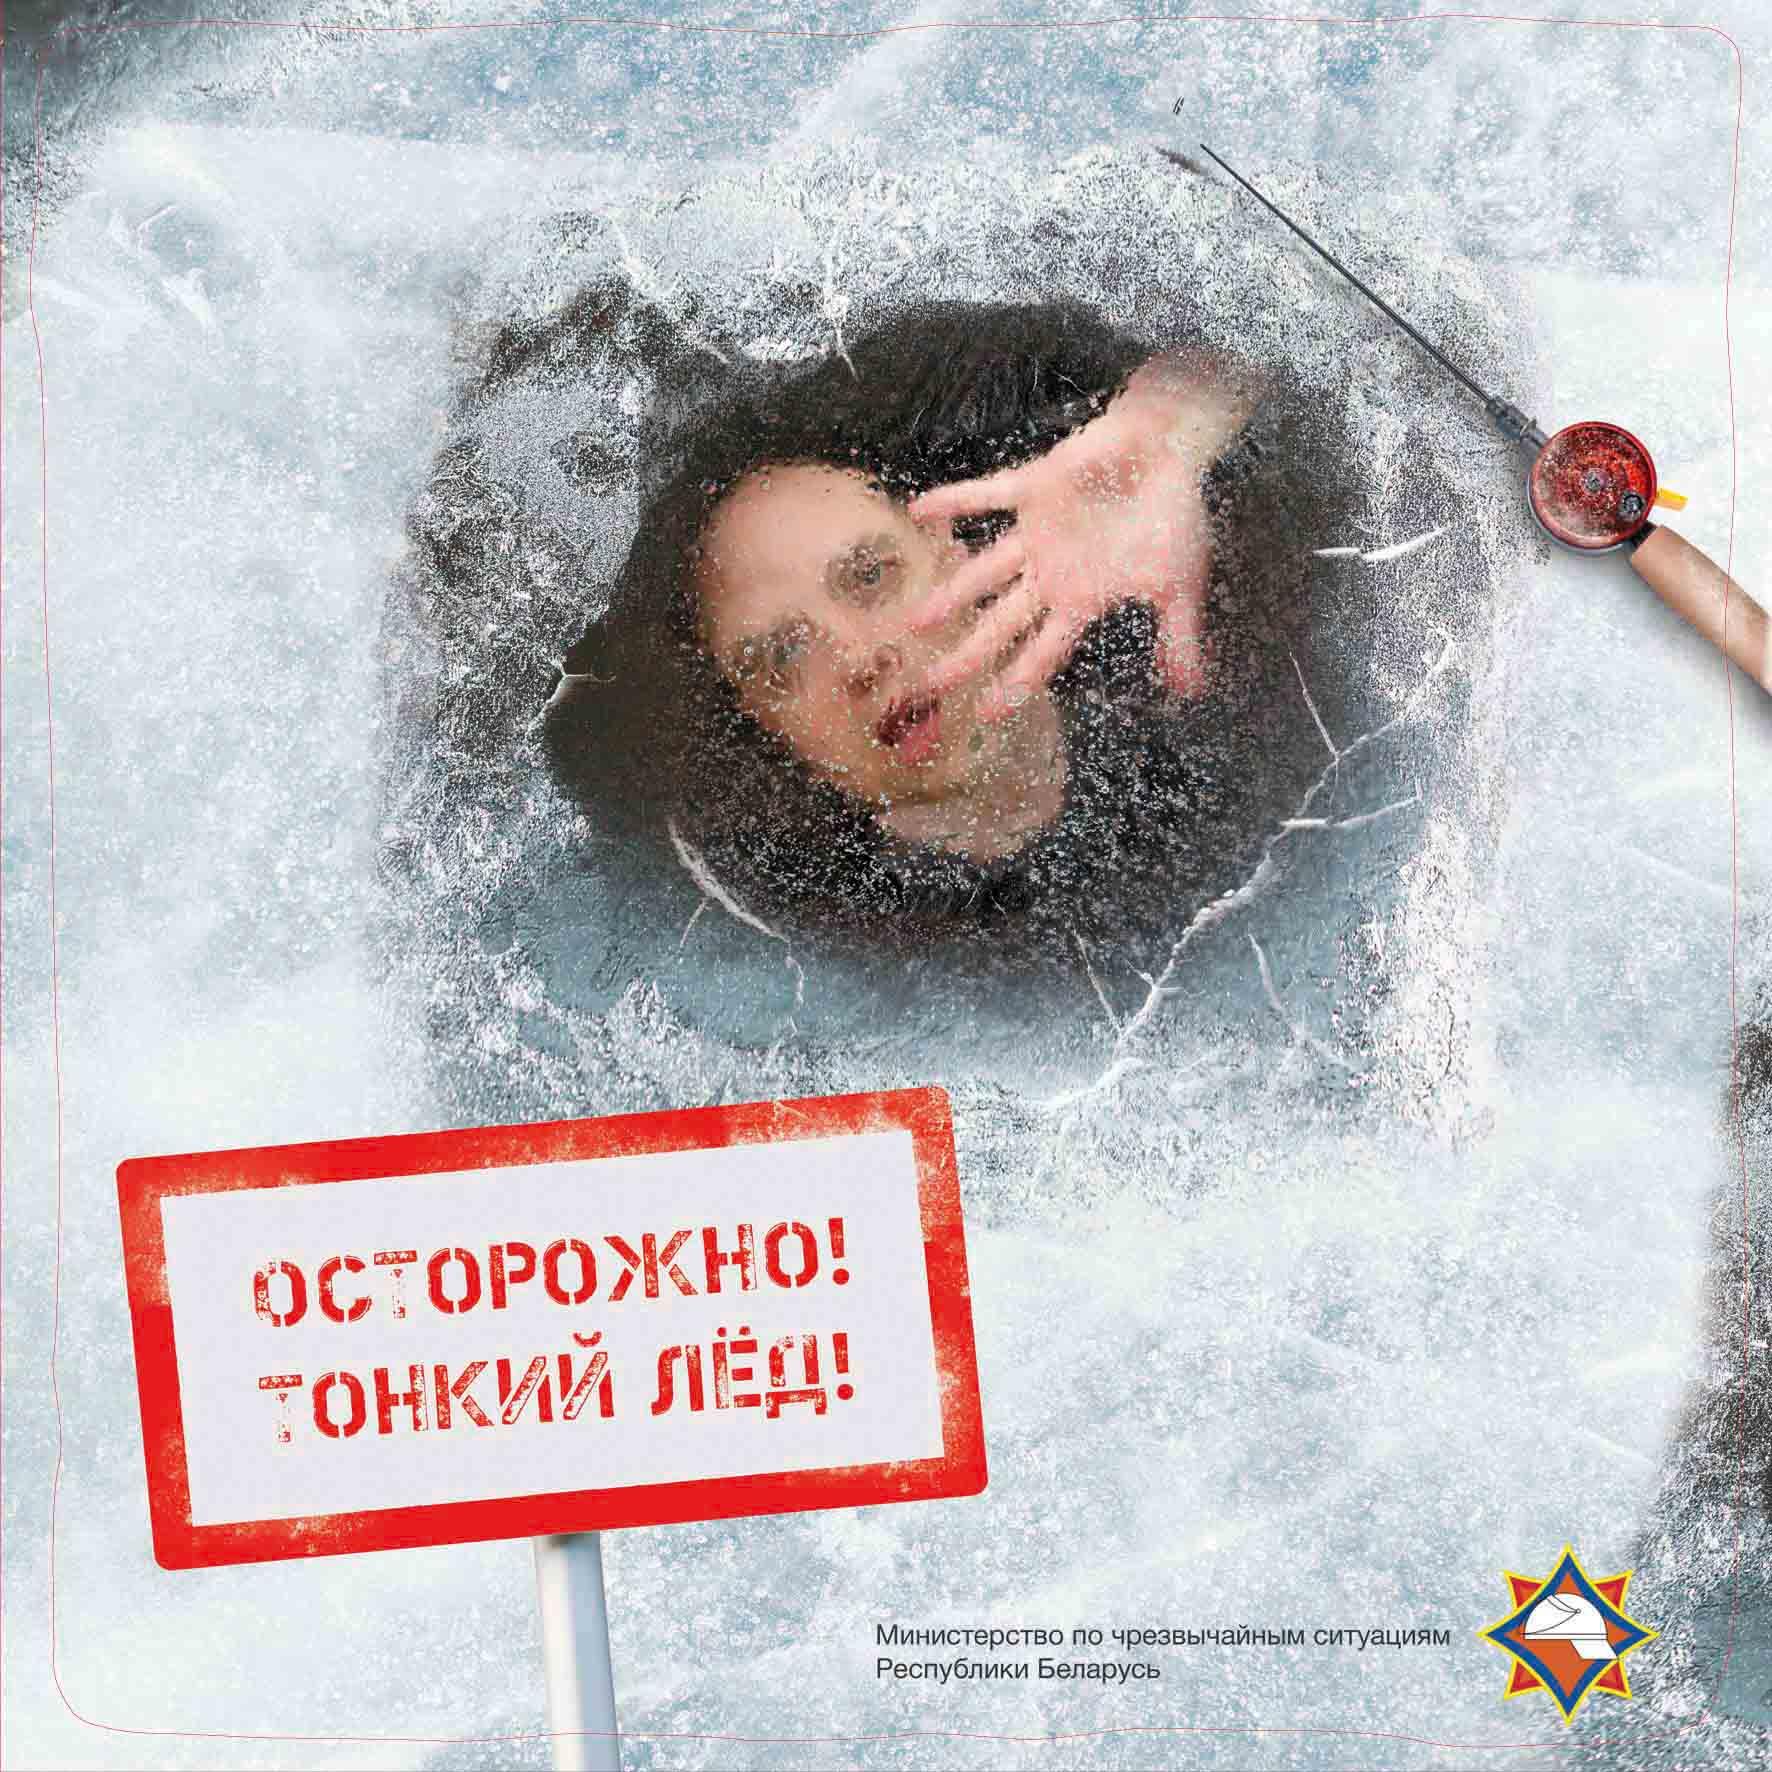 Картинки опасность на воде зимой